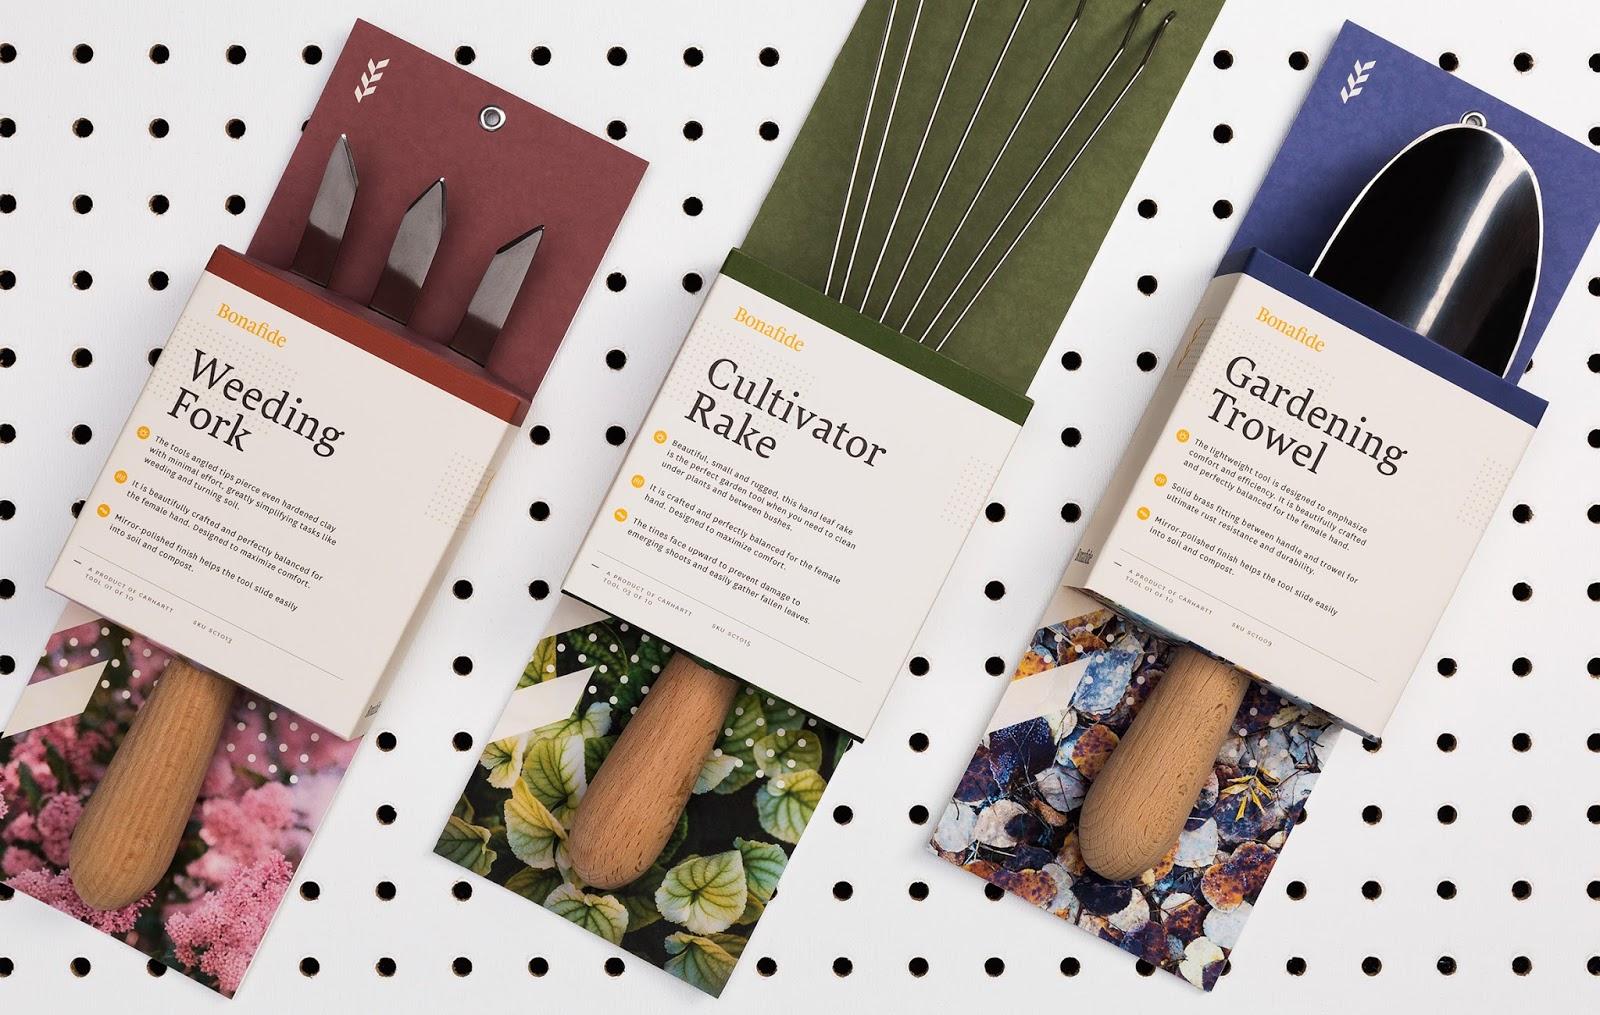 Bonafide garden tools student project on packaging of for Garden design equipment